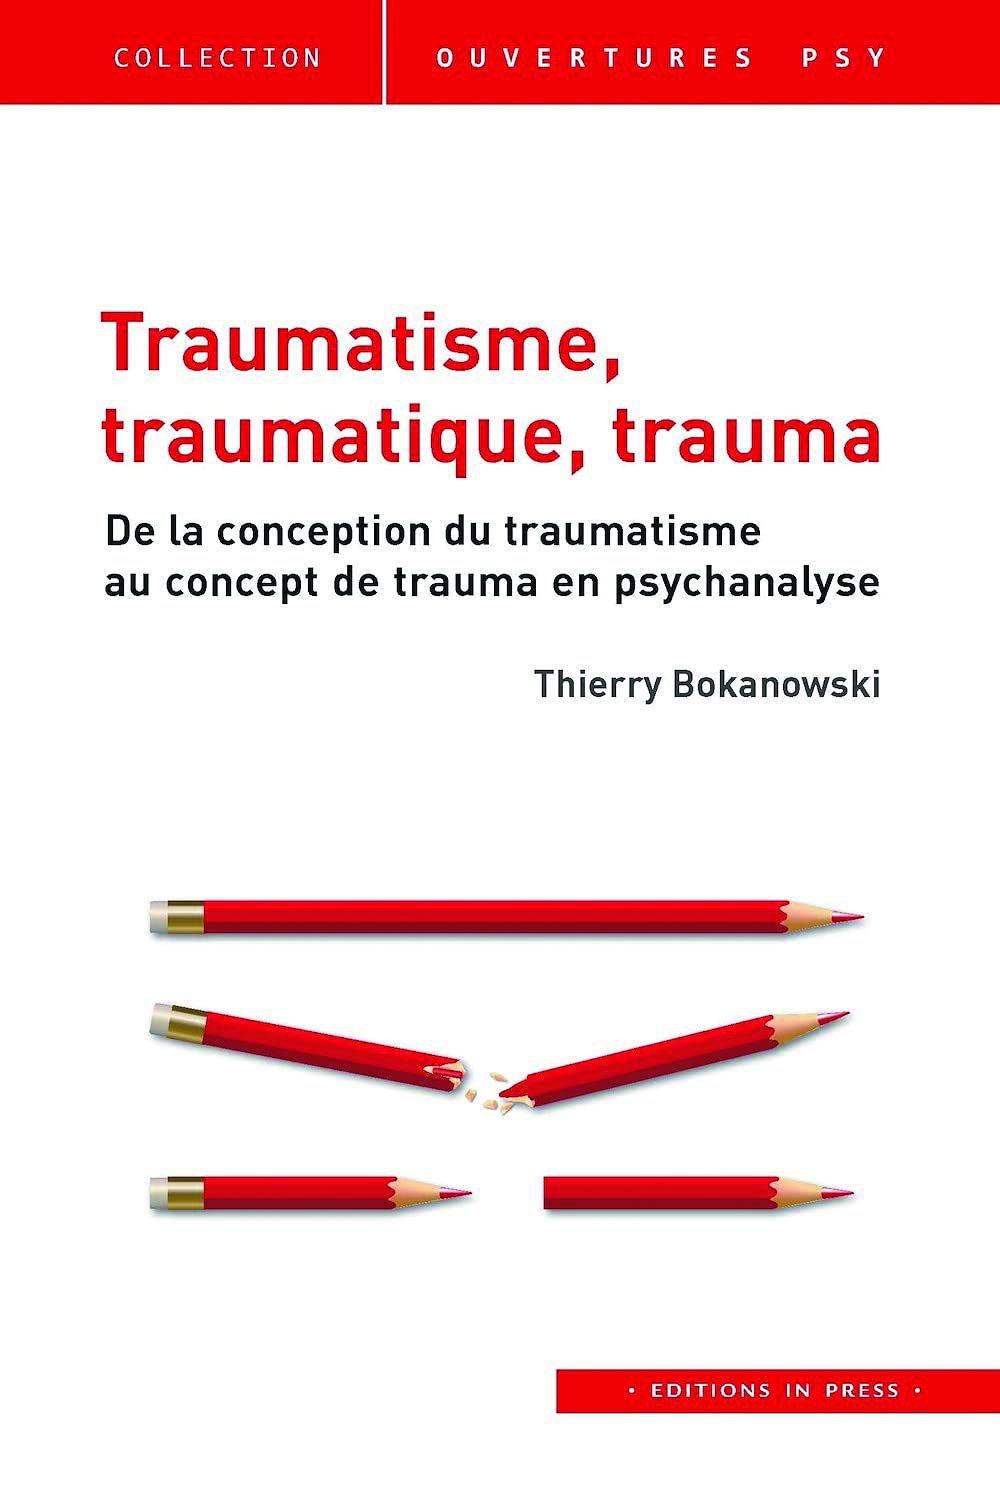 Traumatisme, traumatique, trauma. De la conception du traumatisme au concept de trauma en psychanalyse